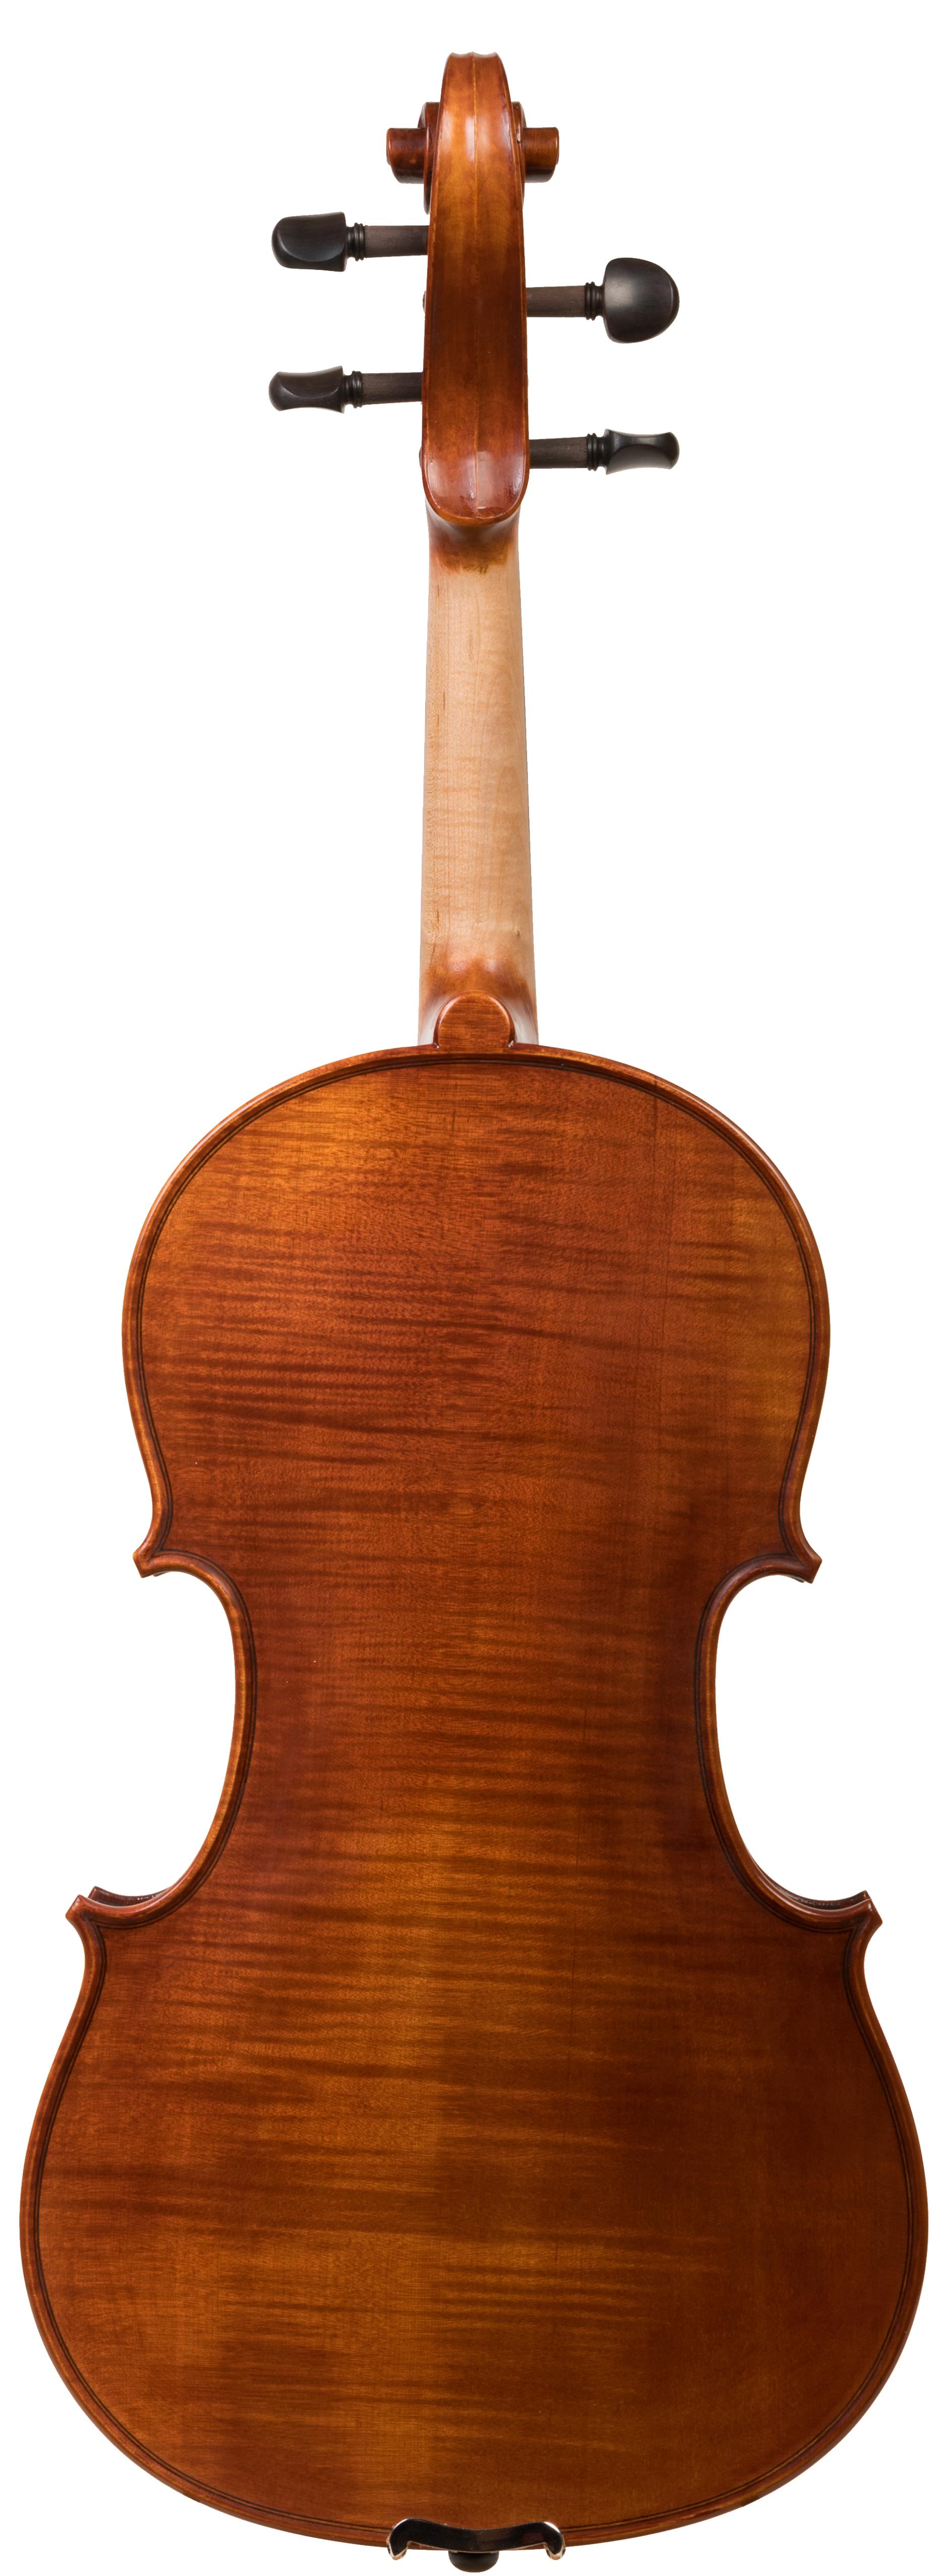 Seman Violins SV150 back.jpg